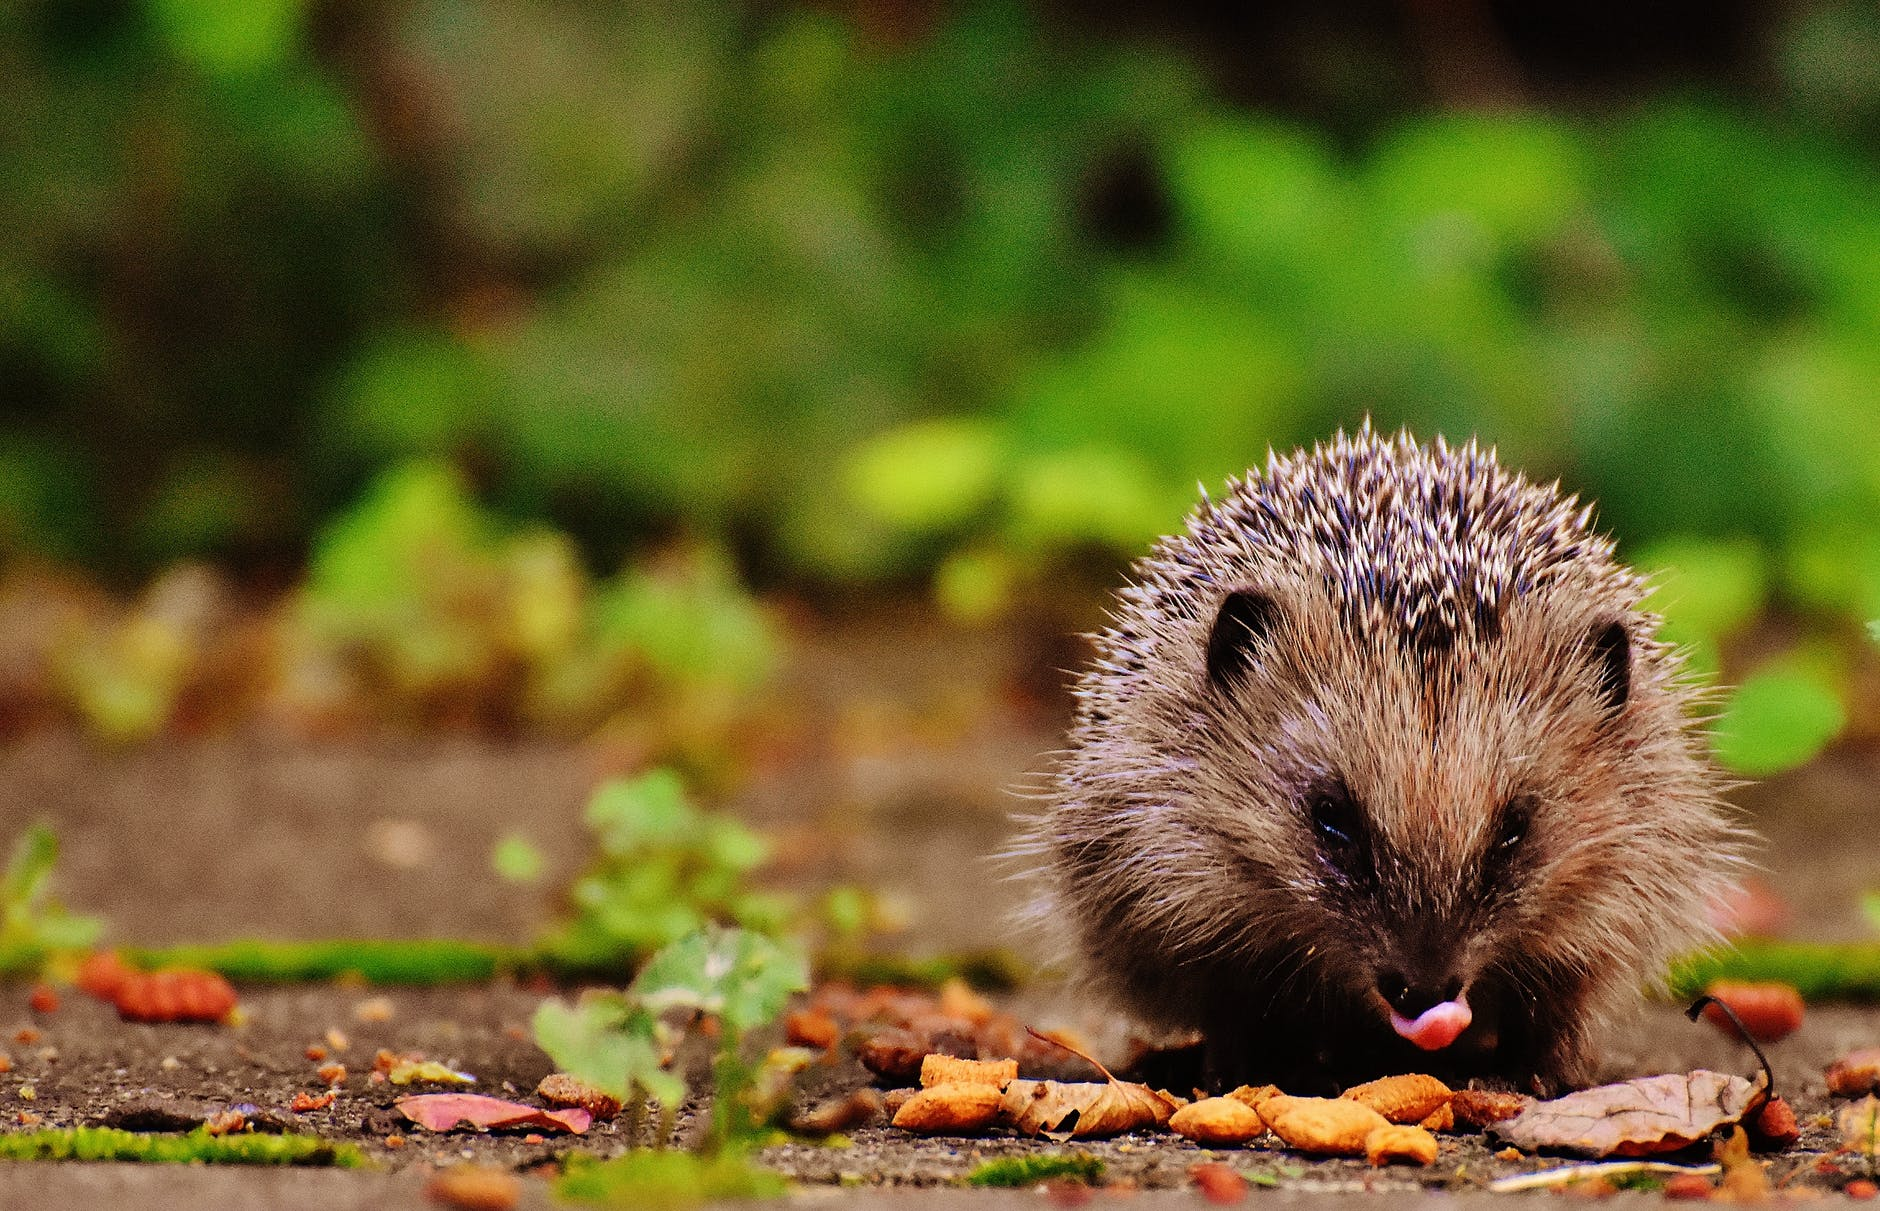 tilt shift photography of brown and gray hedgehog